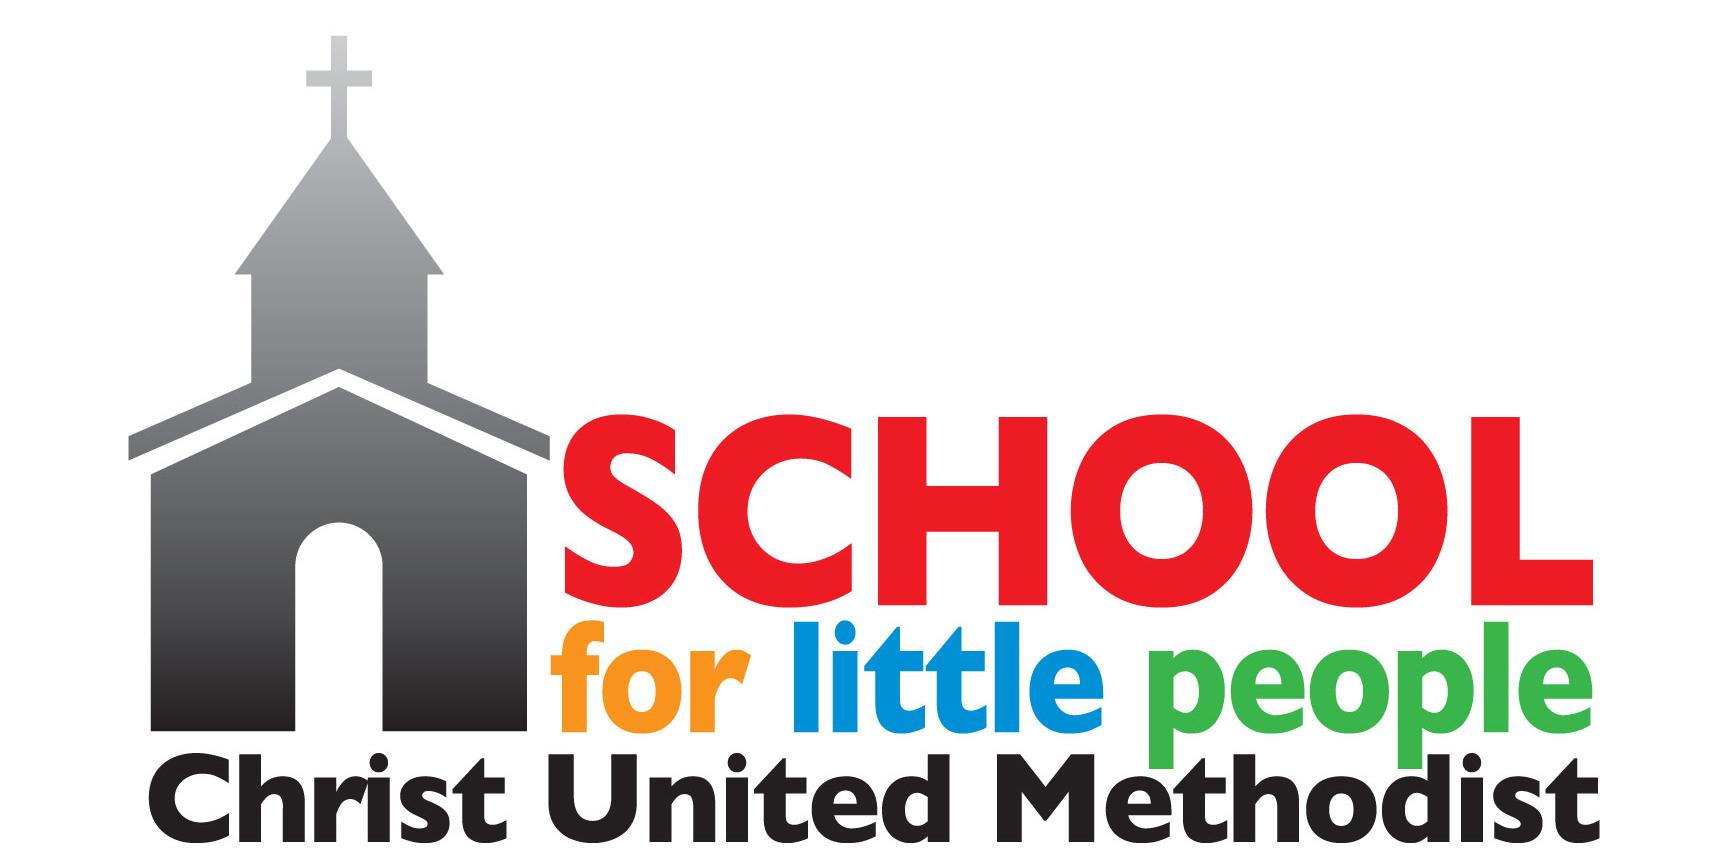 17989-School For Little (16x9).jpg